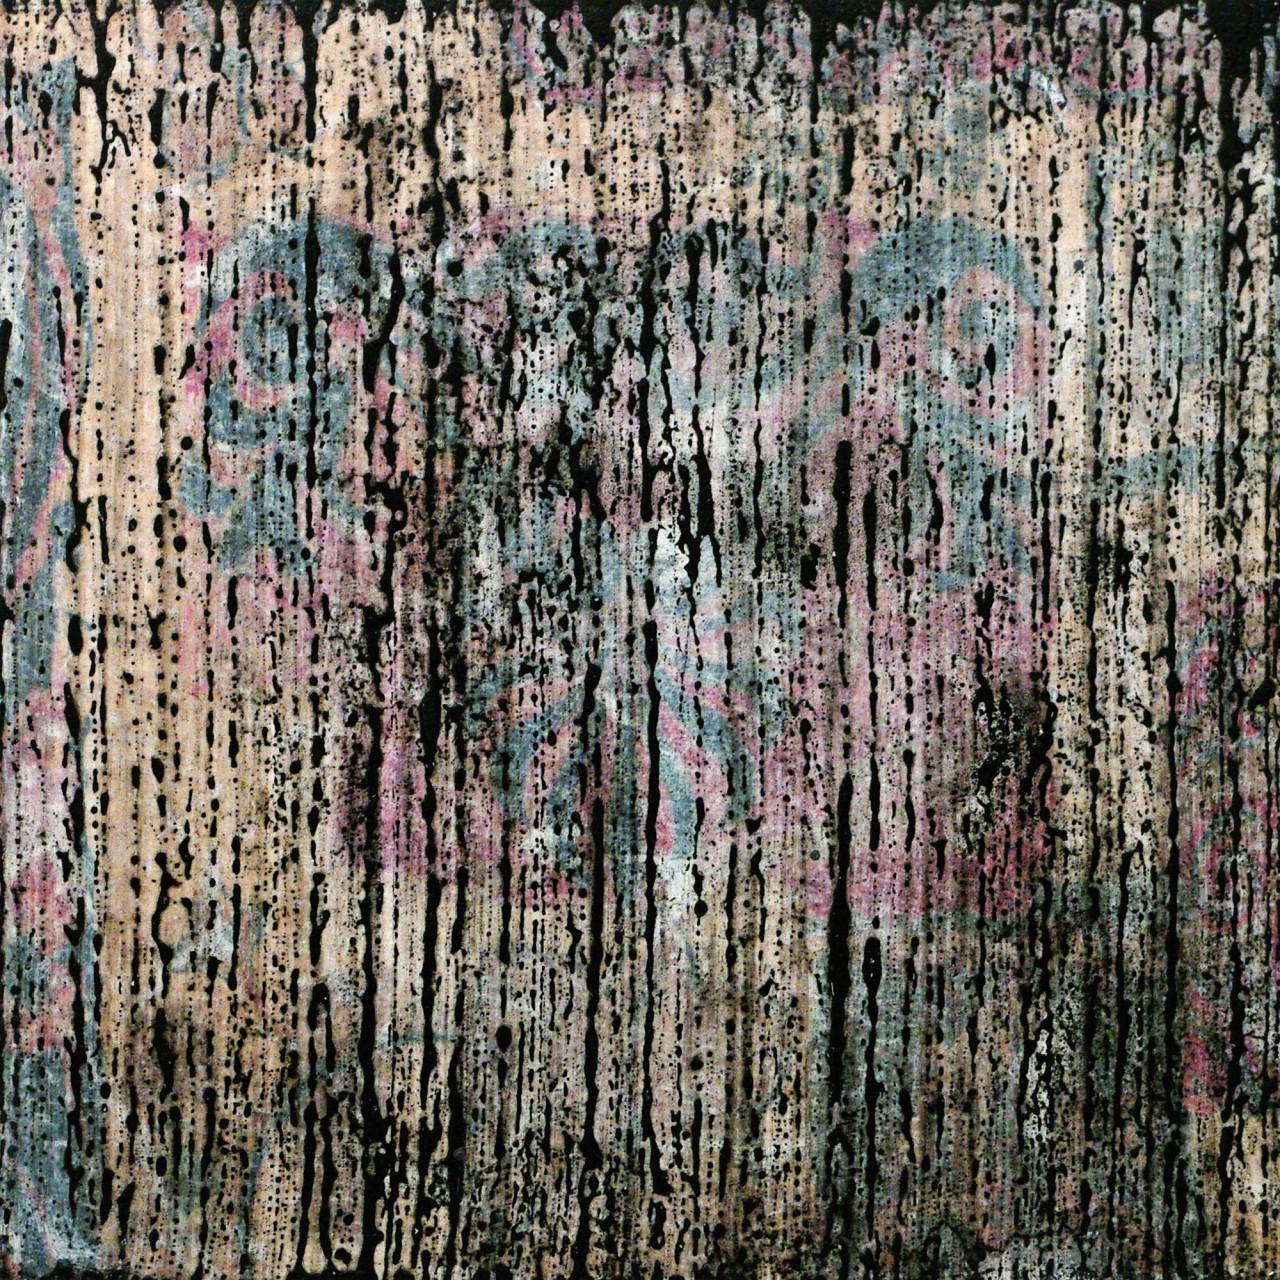 633, 2015 tecnica mista su tavola 30x30 cm